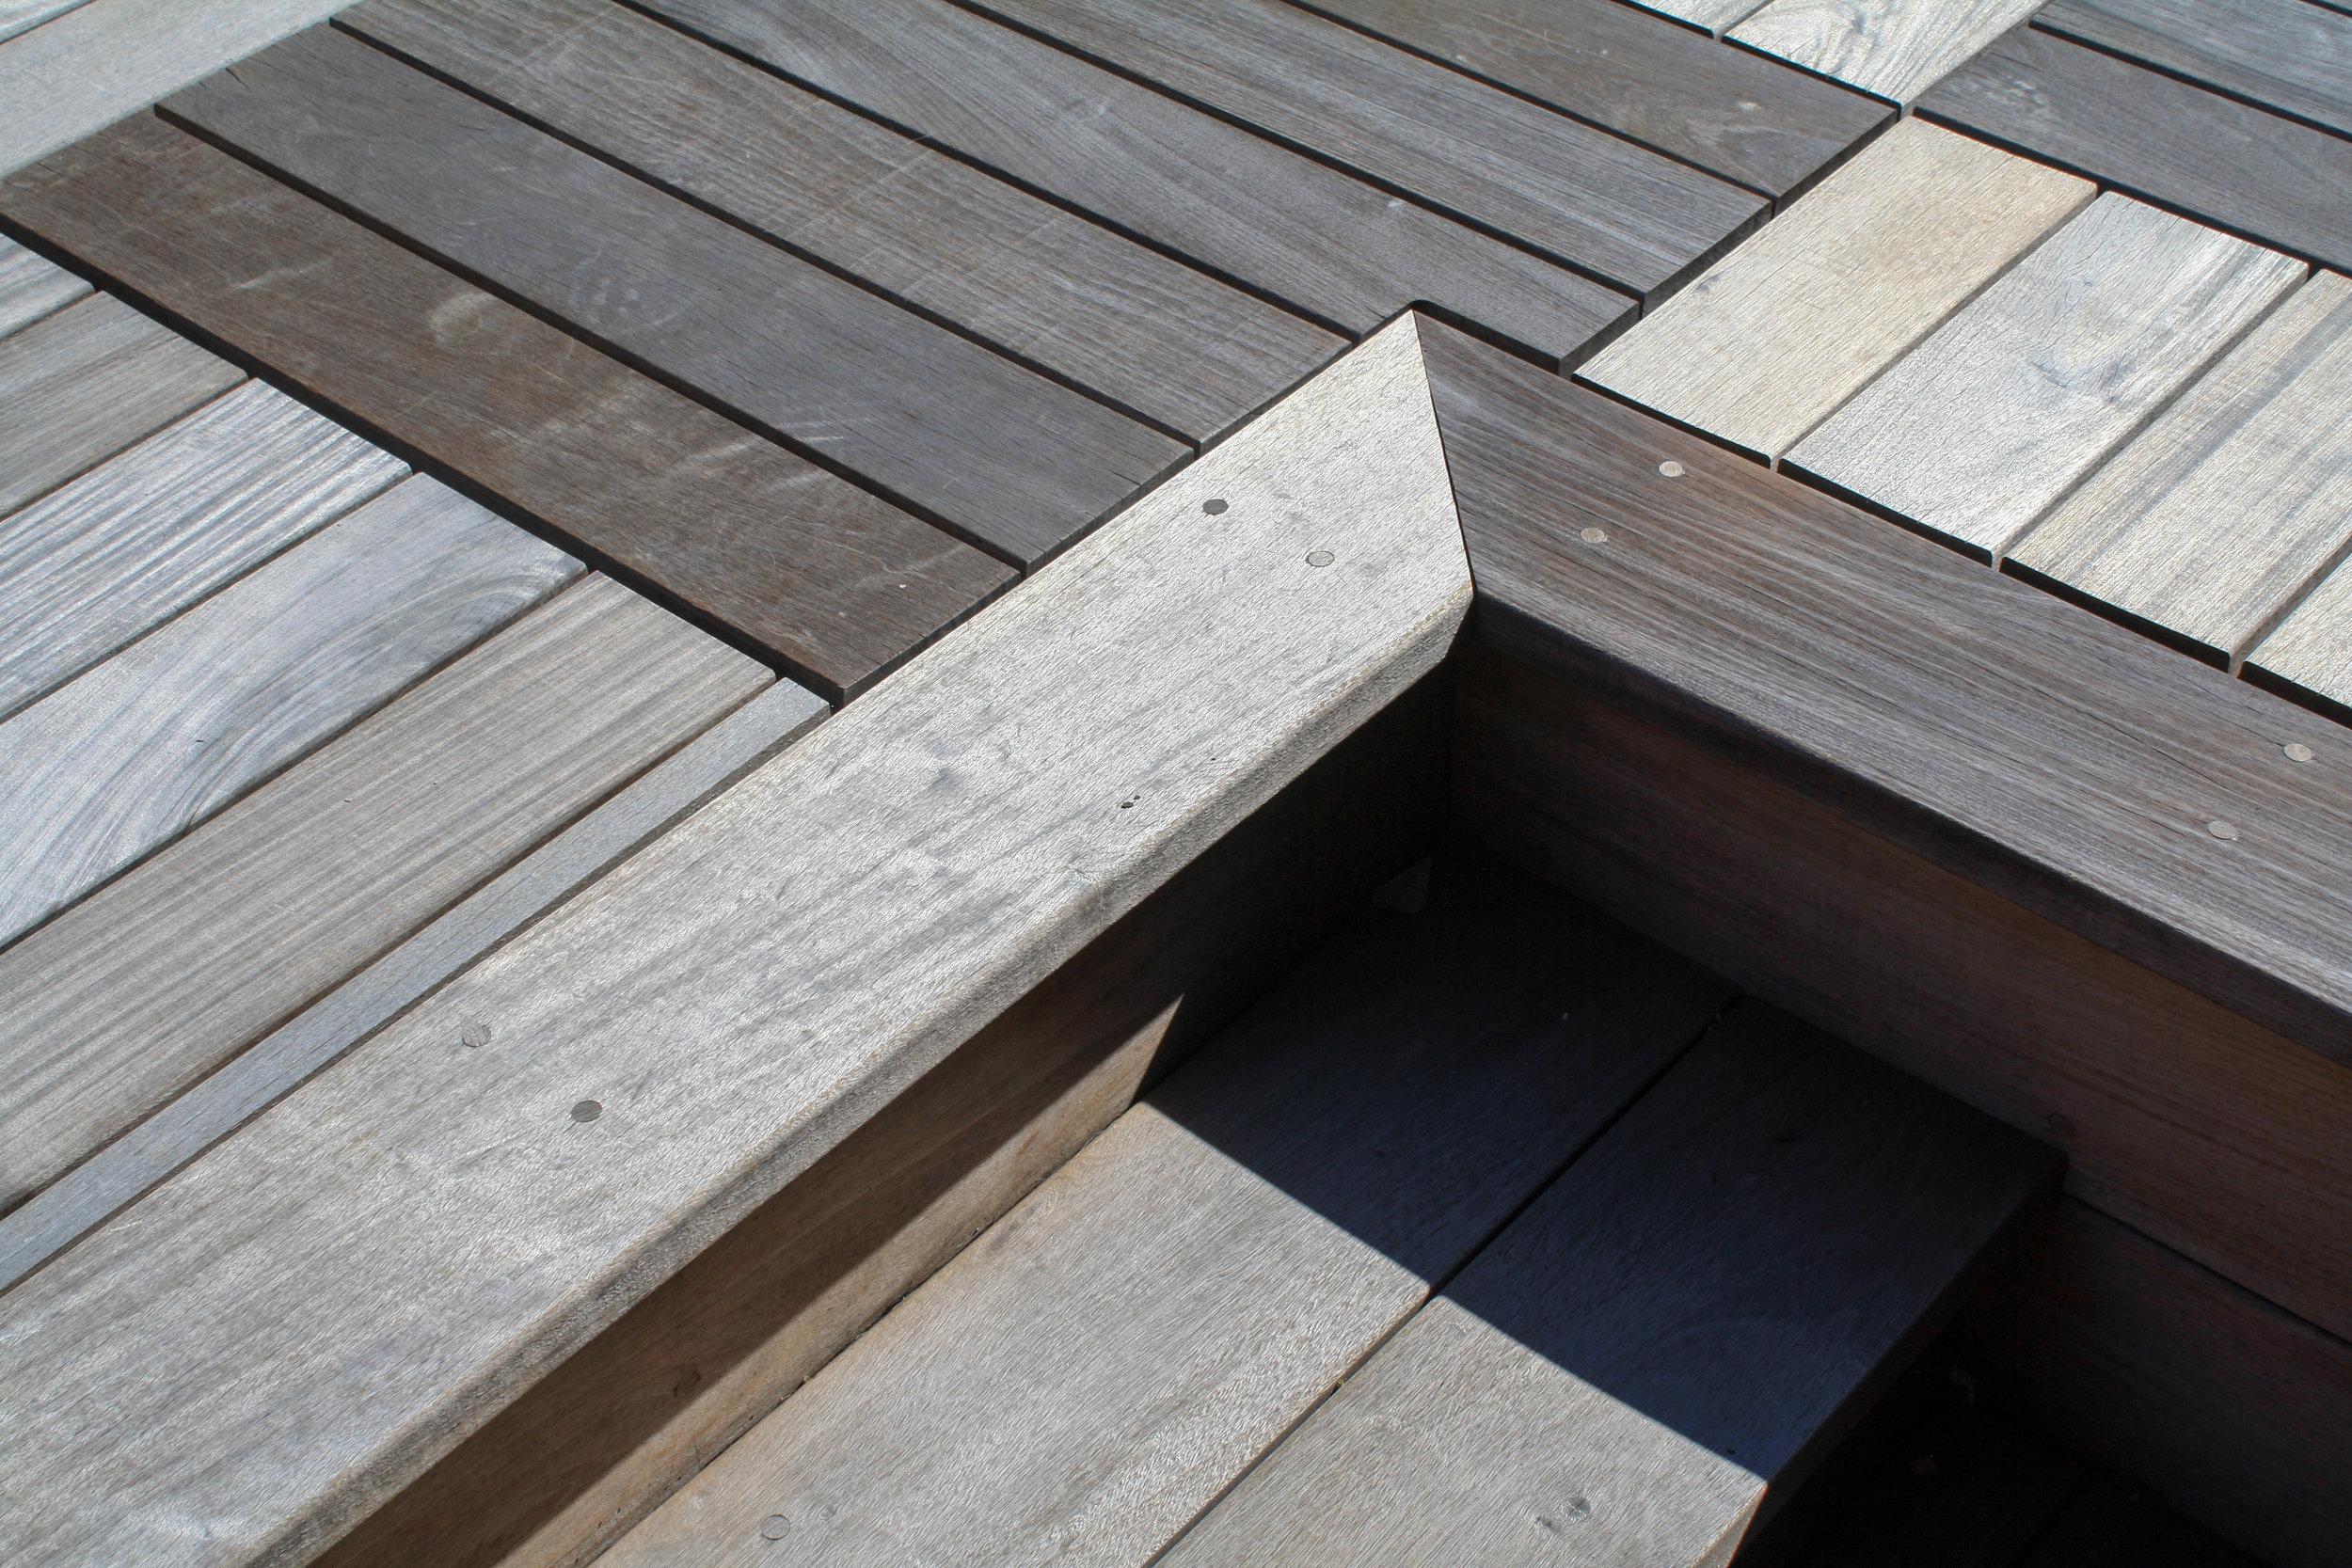 recover-residential-roof-deck-boston-20180628-9.jpg